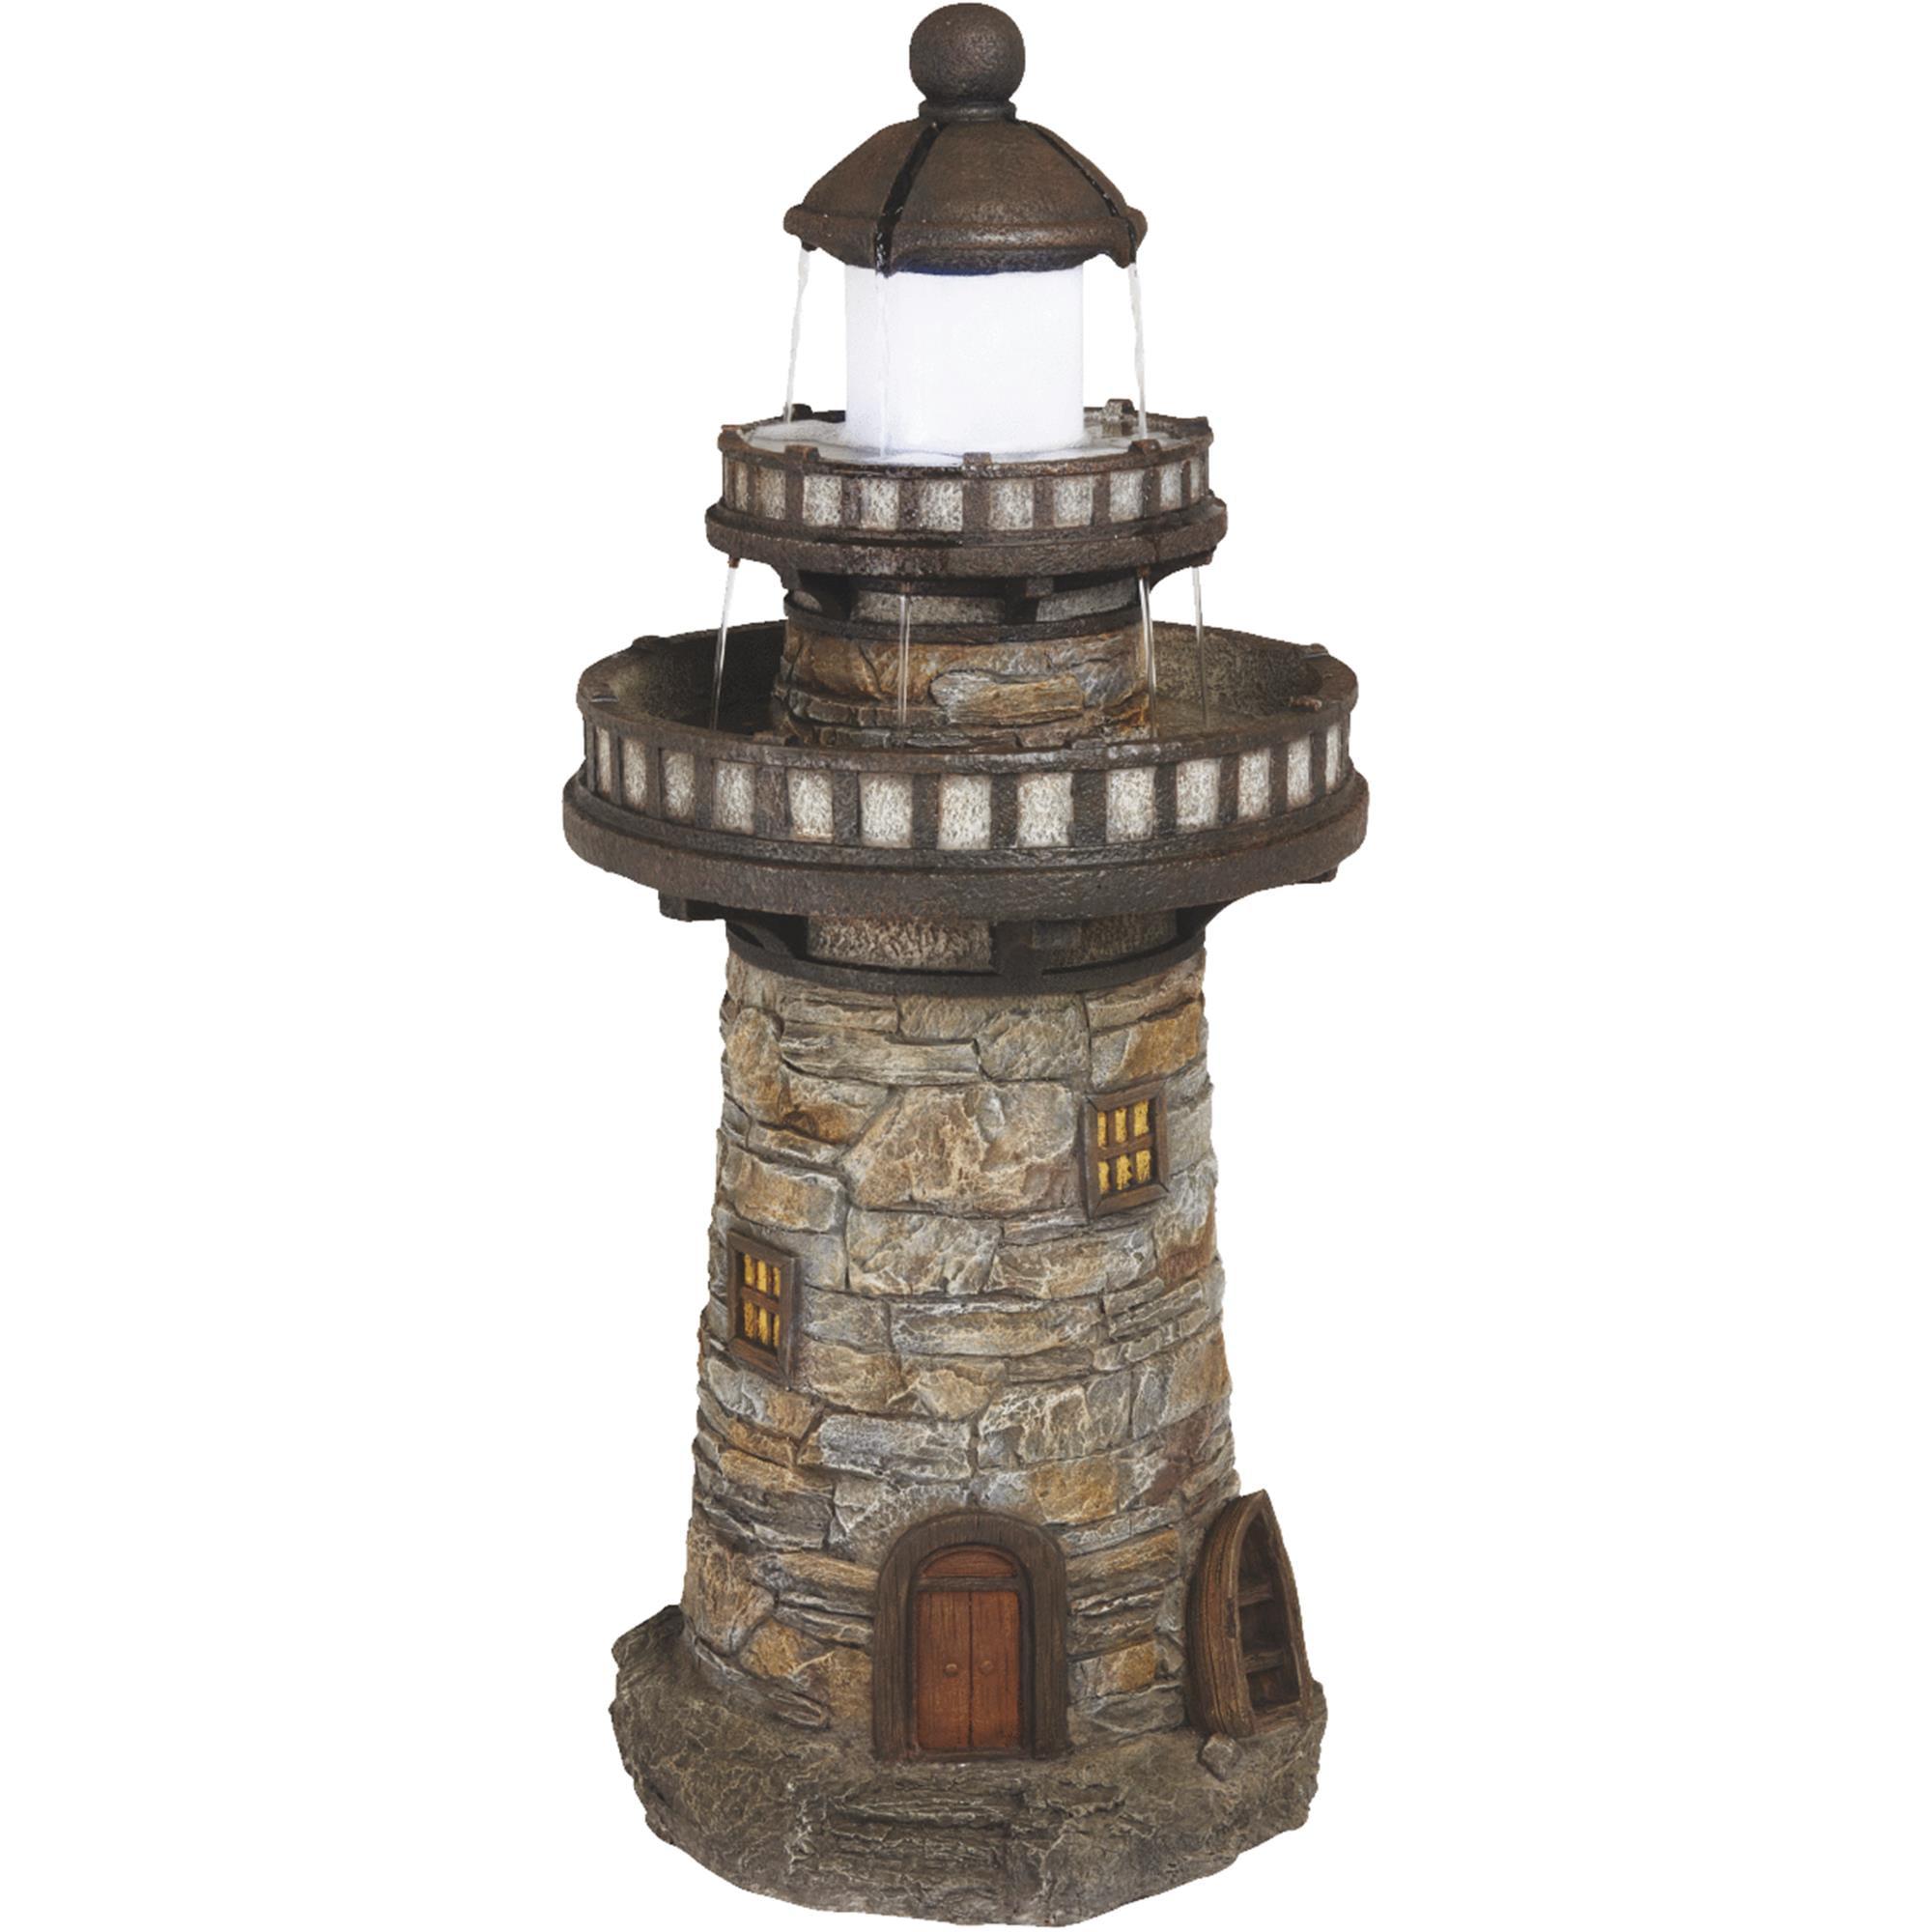 Best Garden Lighthouse Fountain by SIM Supply, Inc.